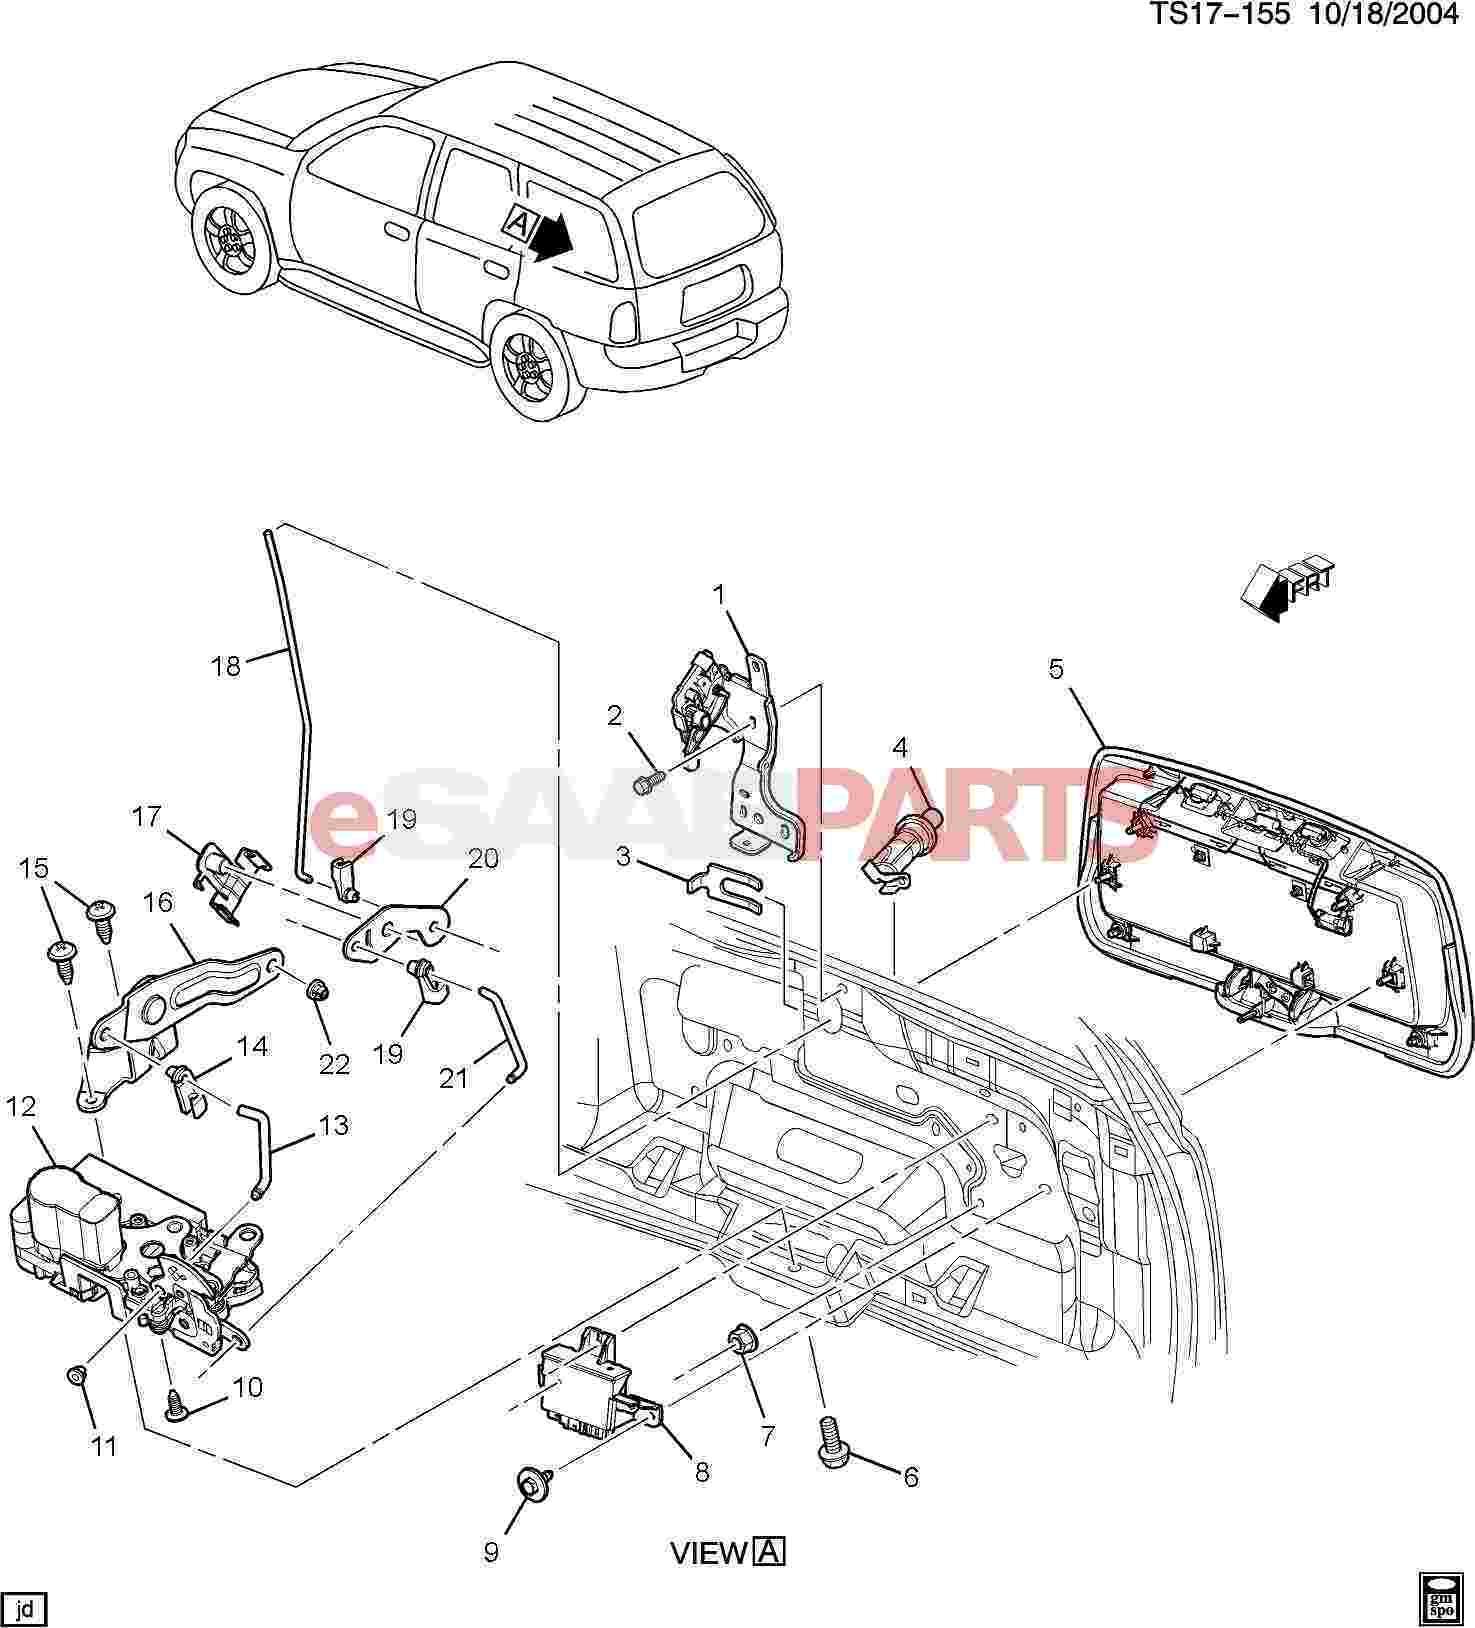 available part diagrams 7 in body hardware lift gate wiringesaabparts com saab 9 7x \\u003e car body external parts \\u003e trunk available part diagrams 7 in body hardware lift gate